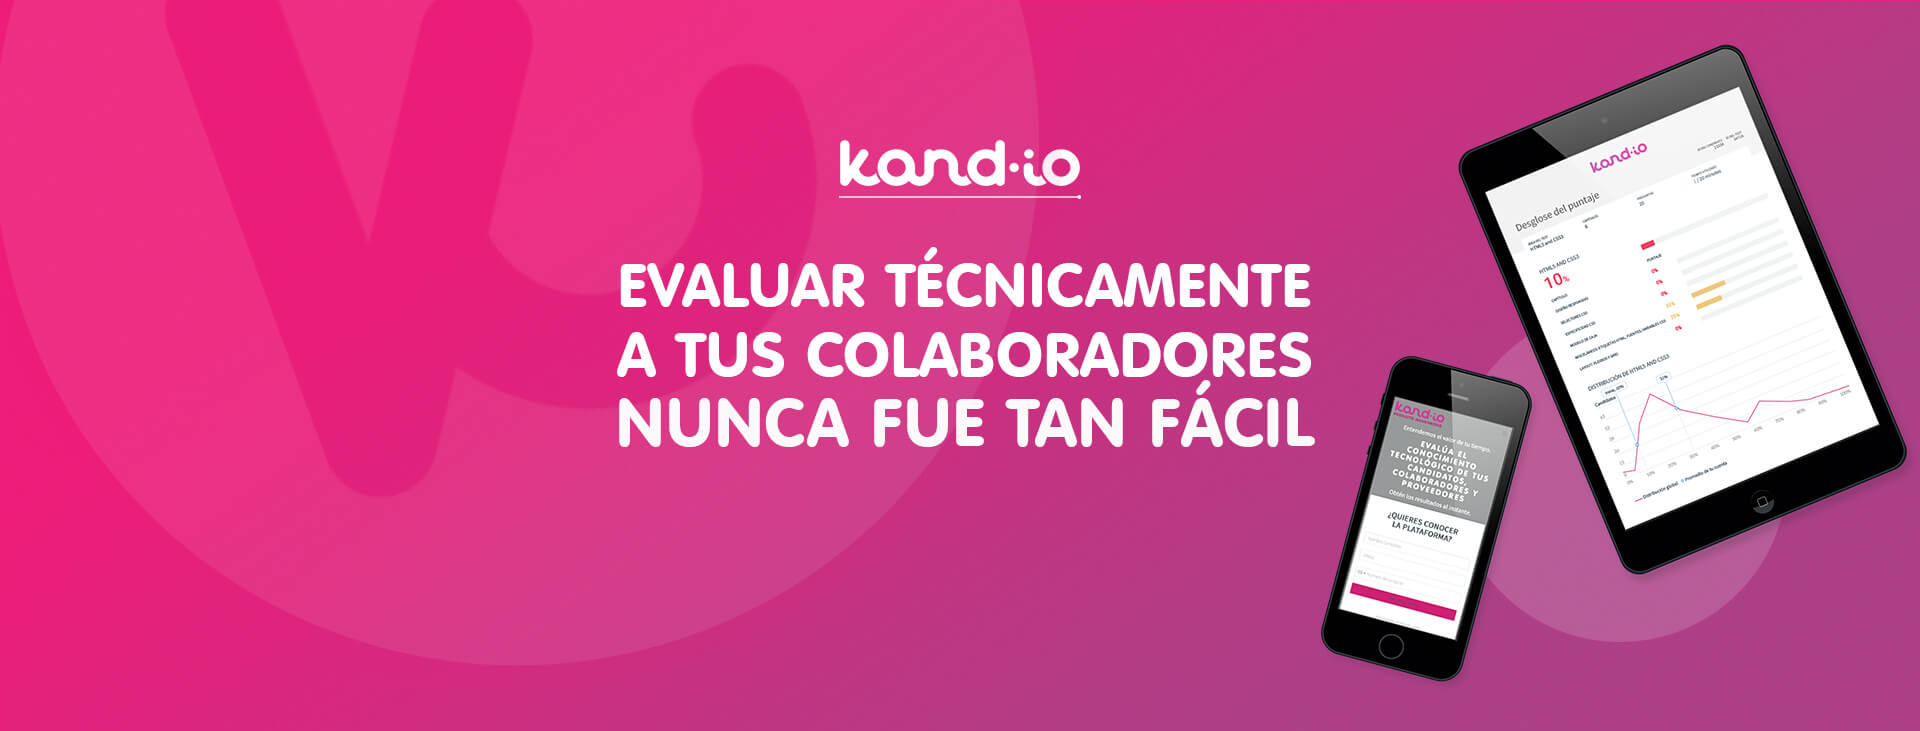 banner-kandio-web